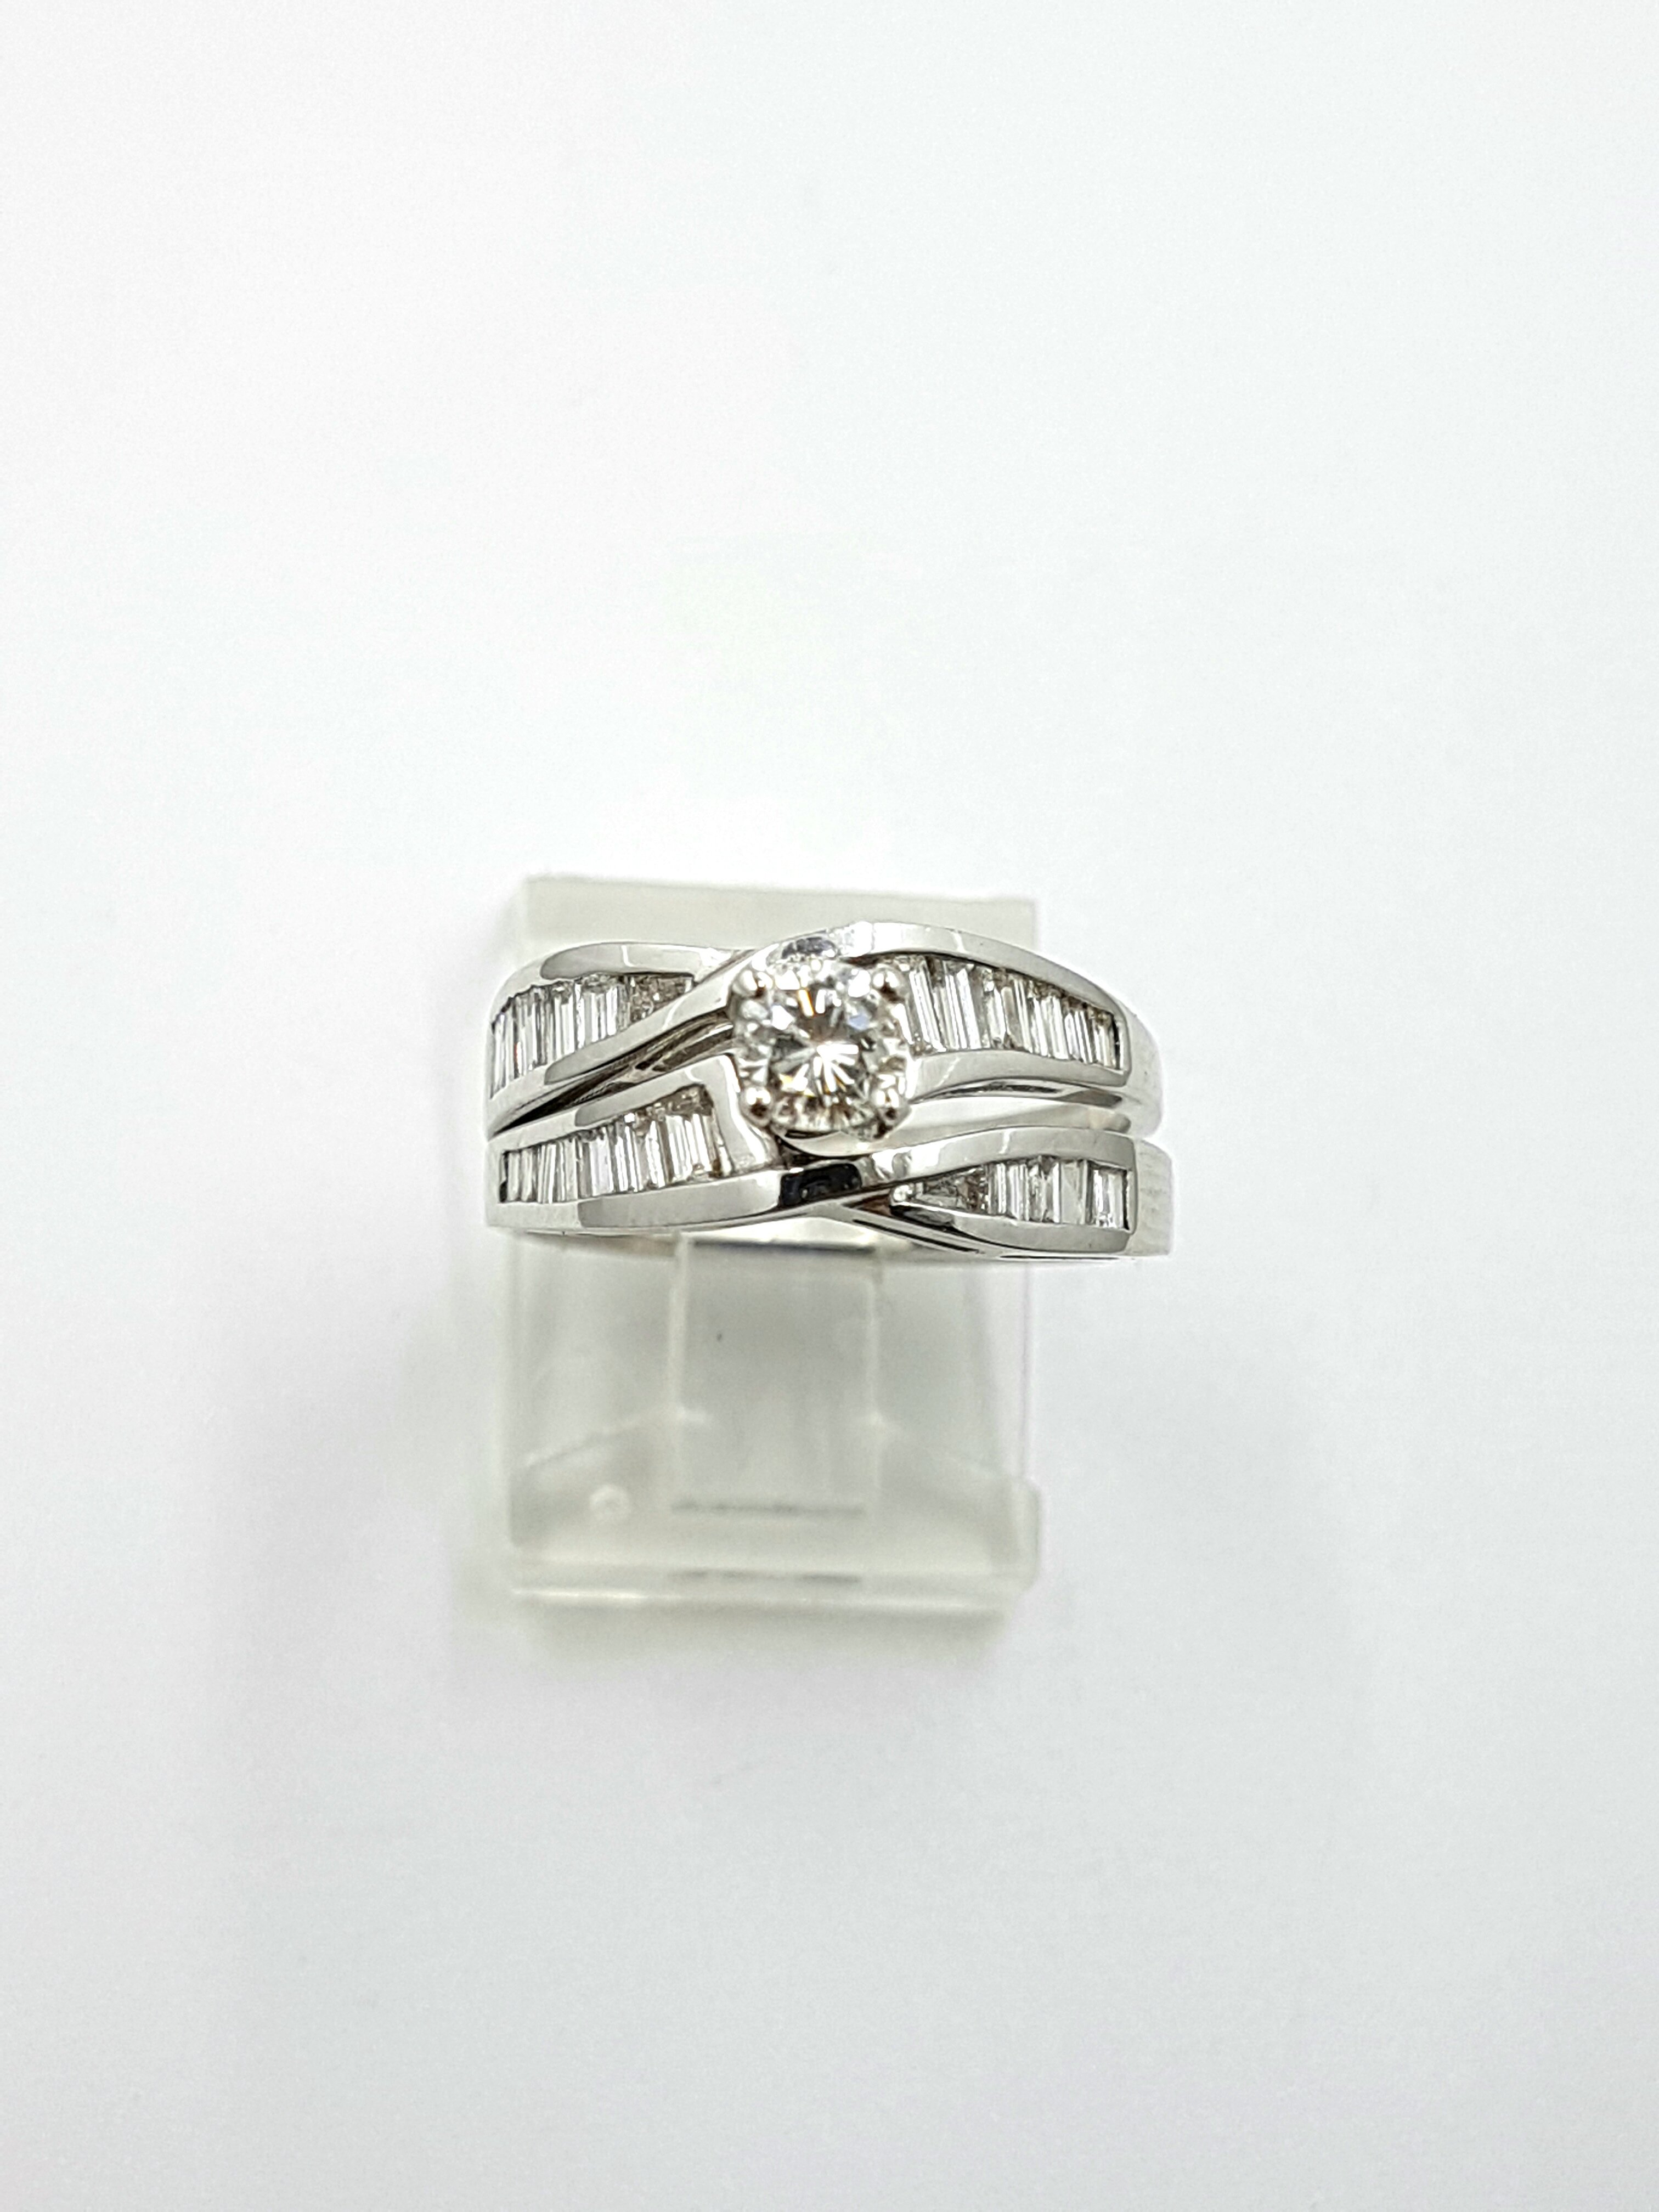 Engagement Ring & Wedding Band 14K White Gold Ring: 0.80ct / Band: 0.50ct 1.30ct Total Regular Price $9840 SALE $2395 Ref: BF354+W